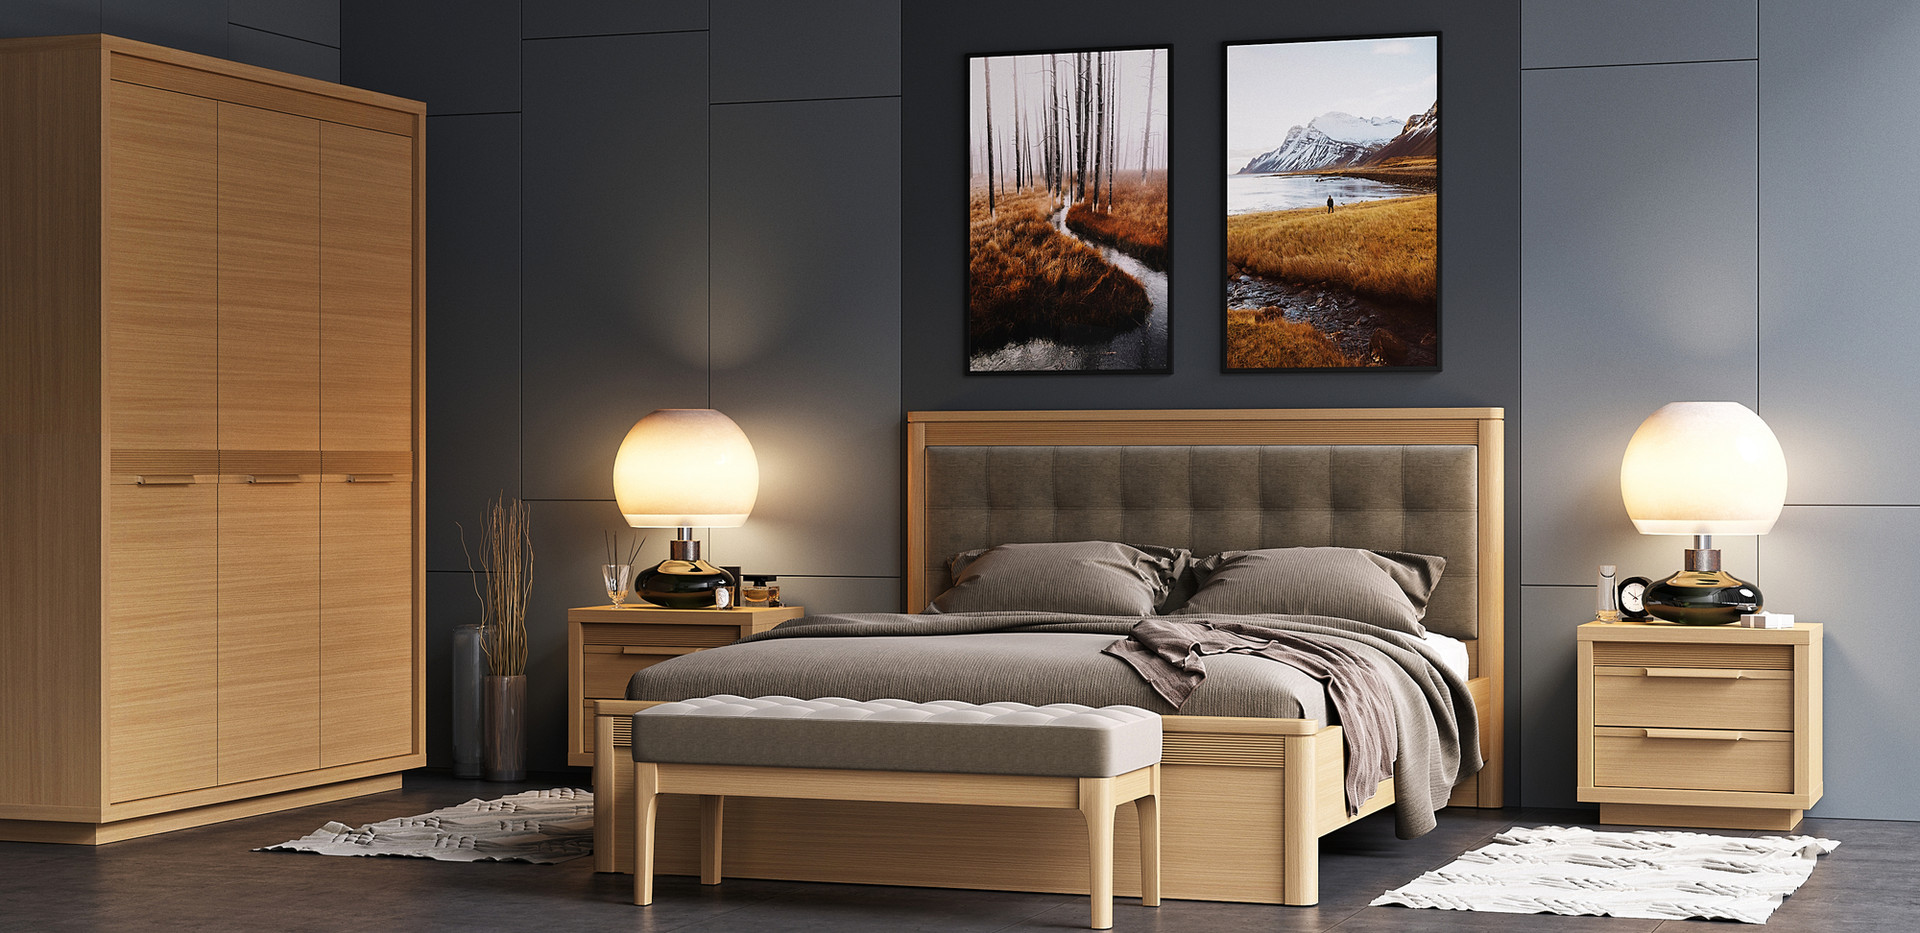 Bedroom_08.jpg